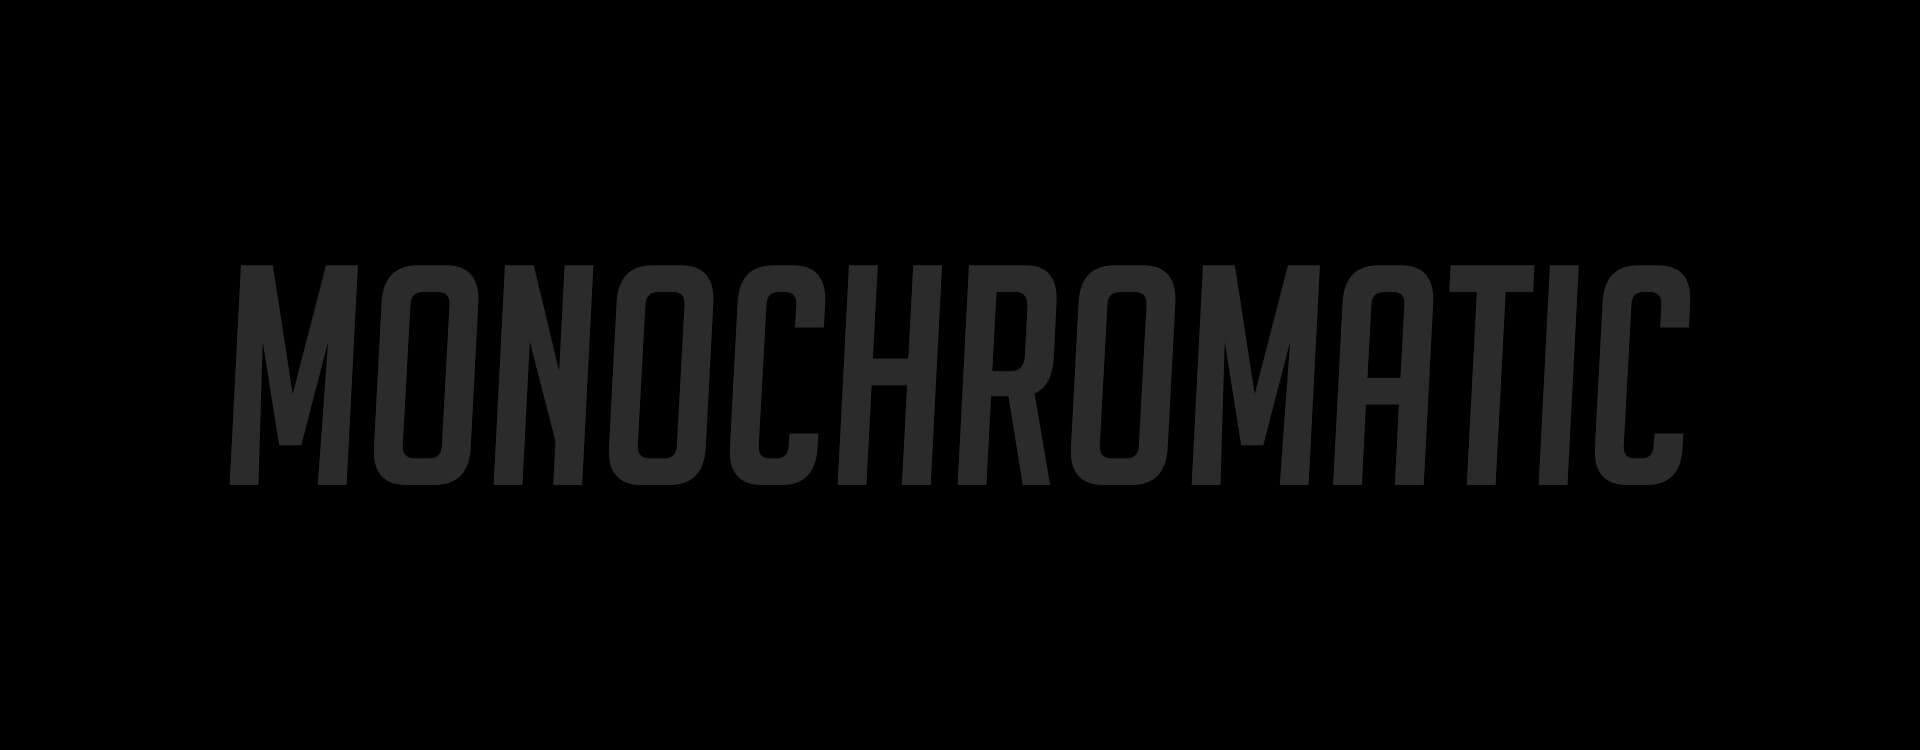 MONCHROME_BANNER